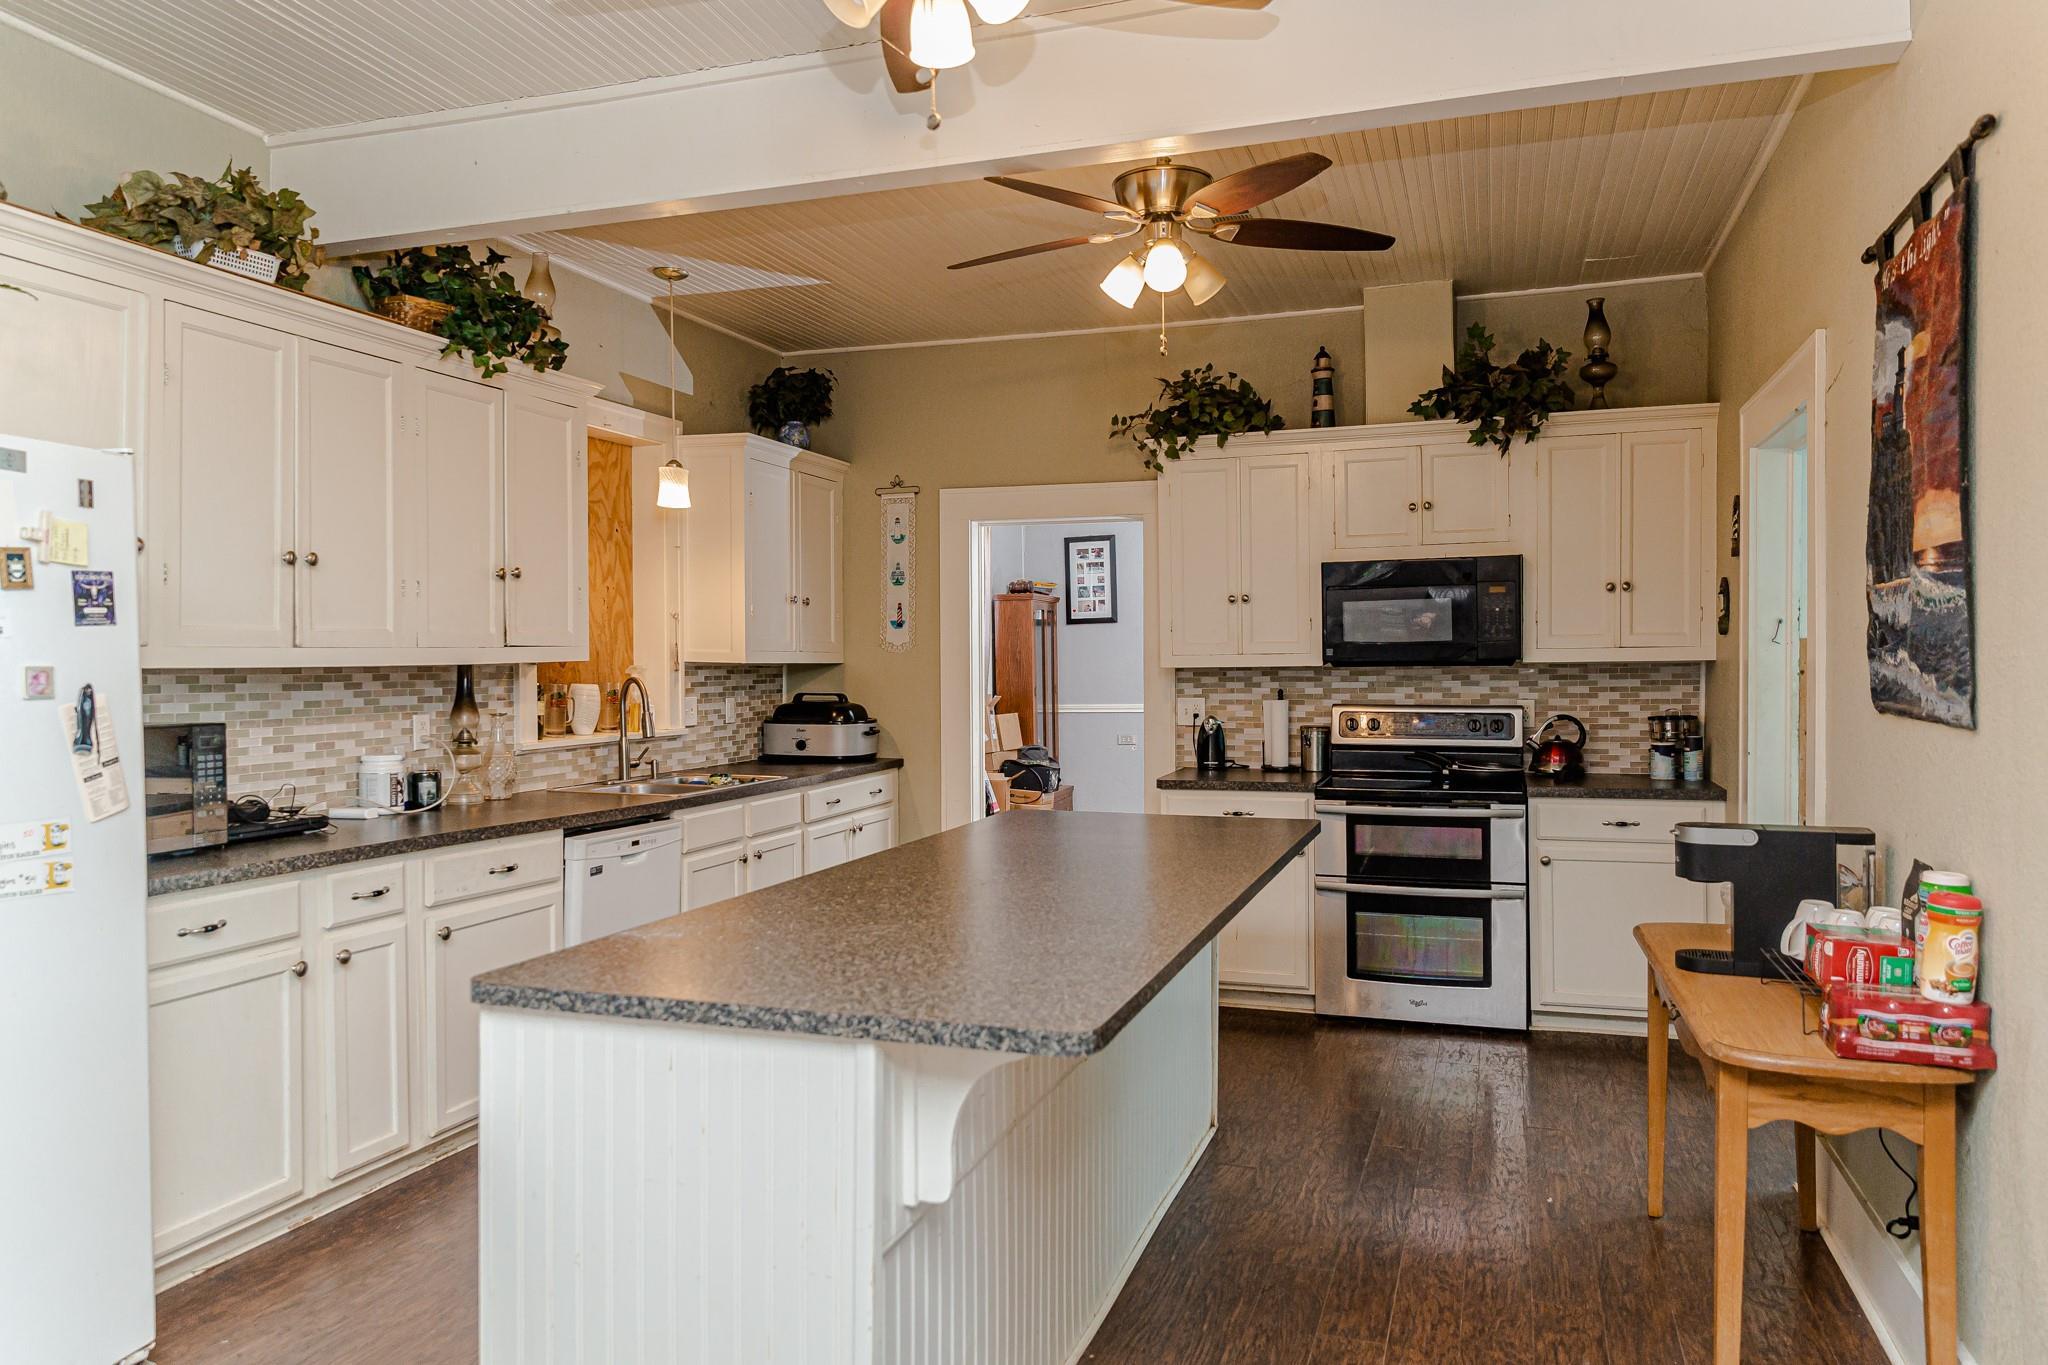 417 Giddings St Property Photo